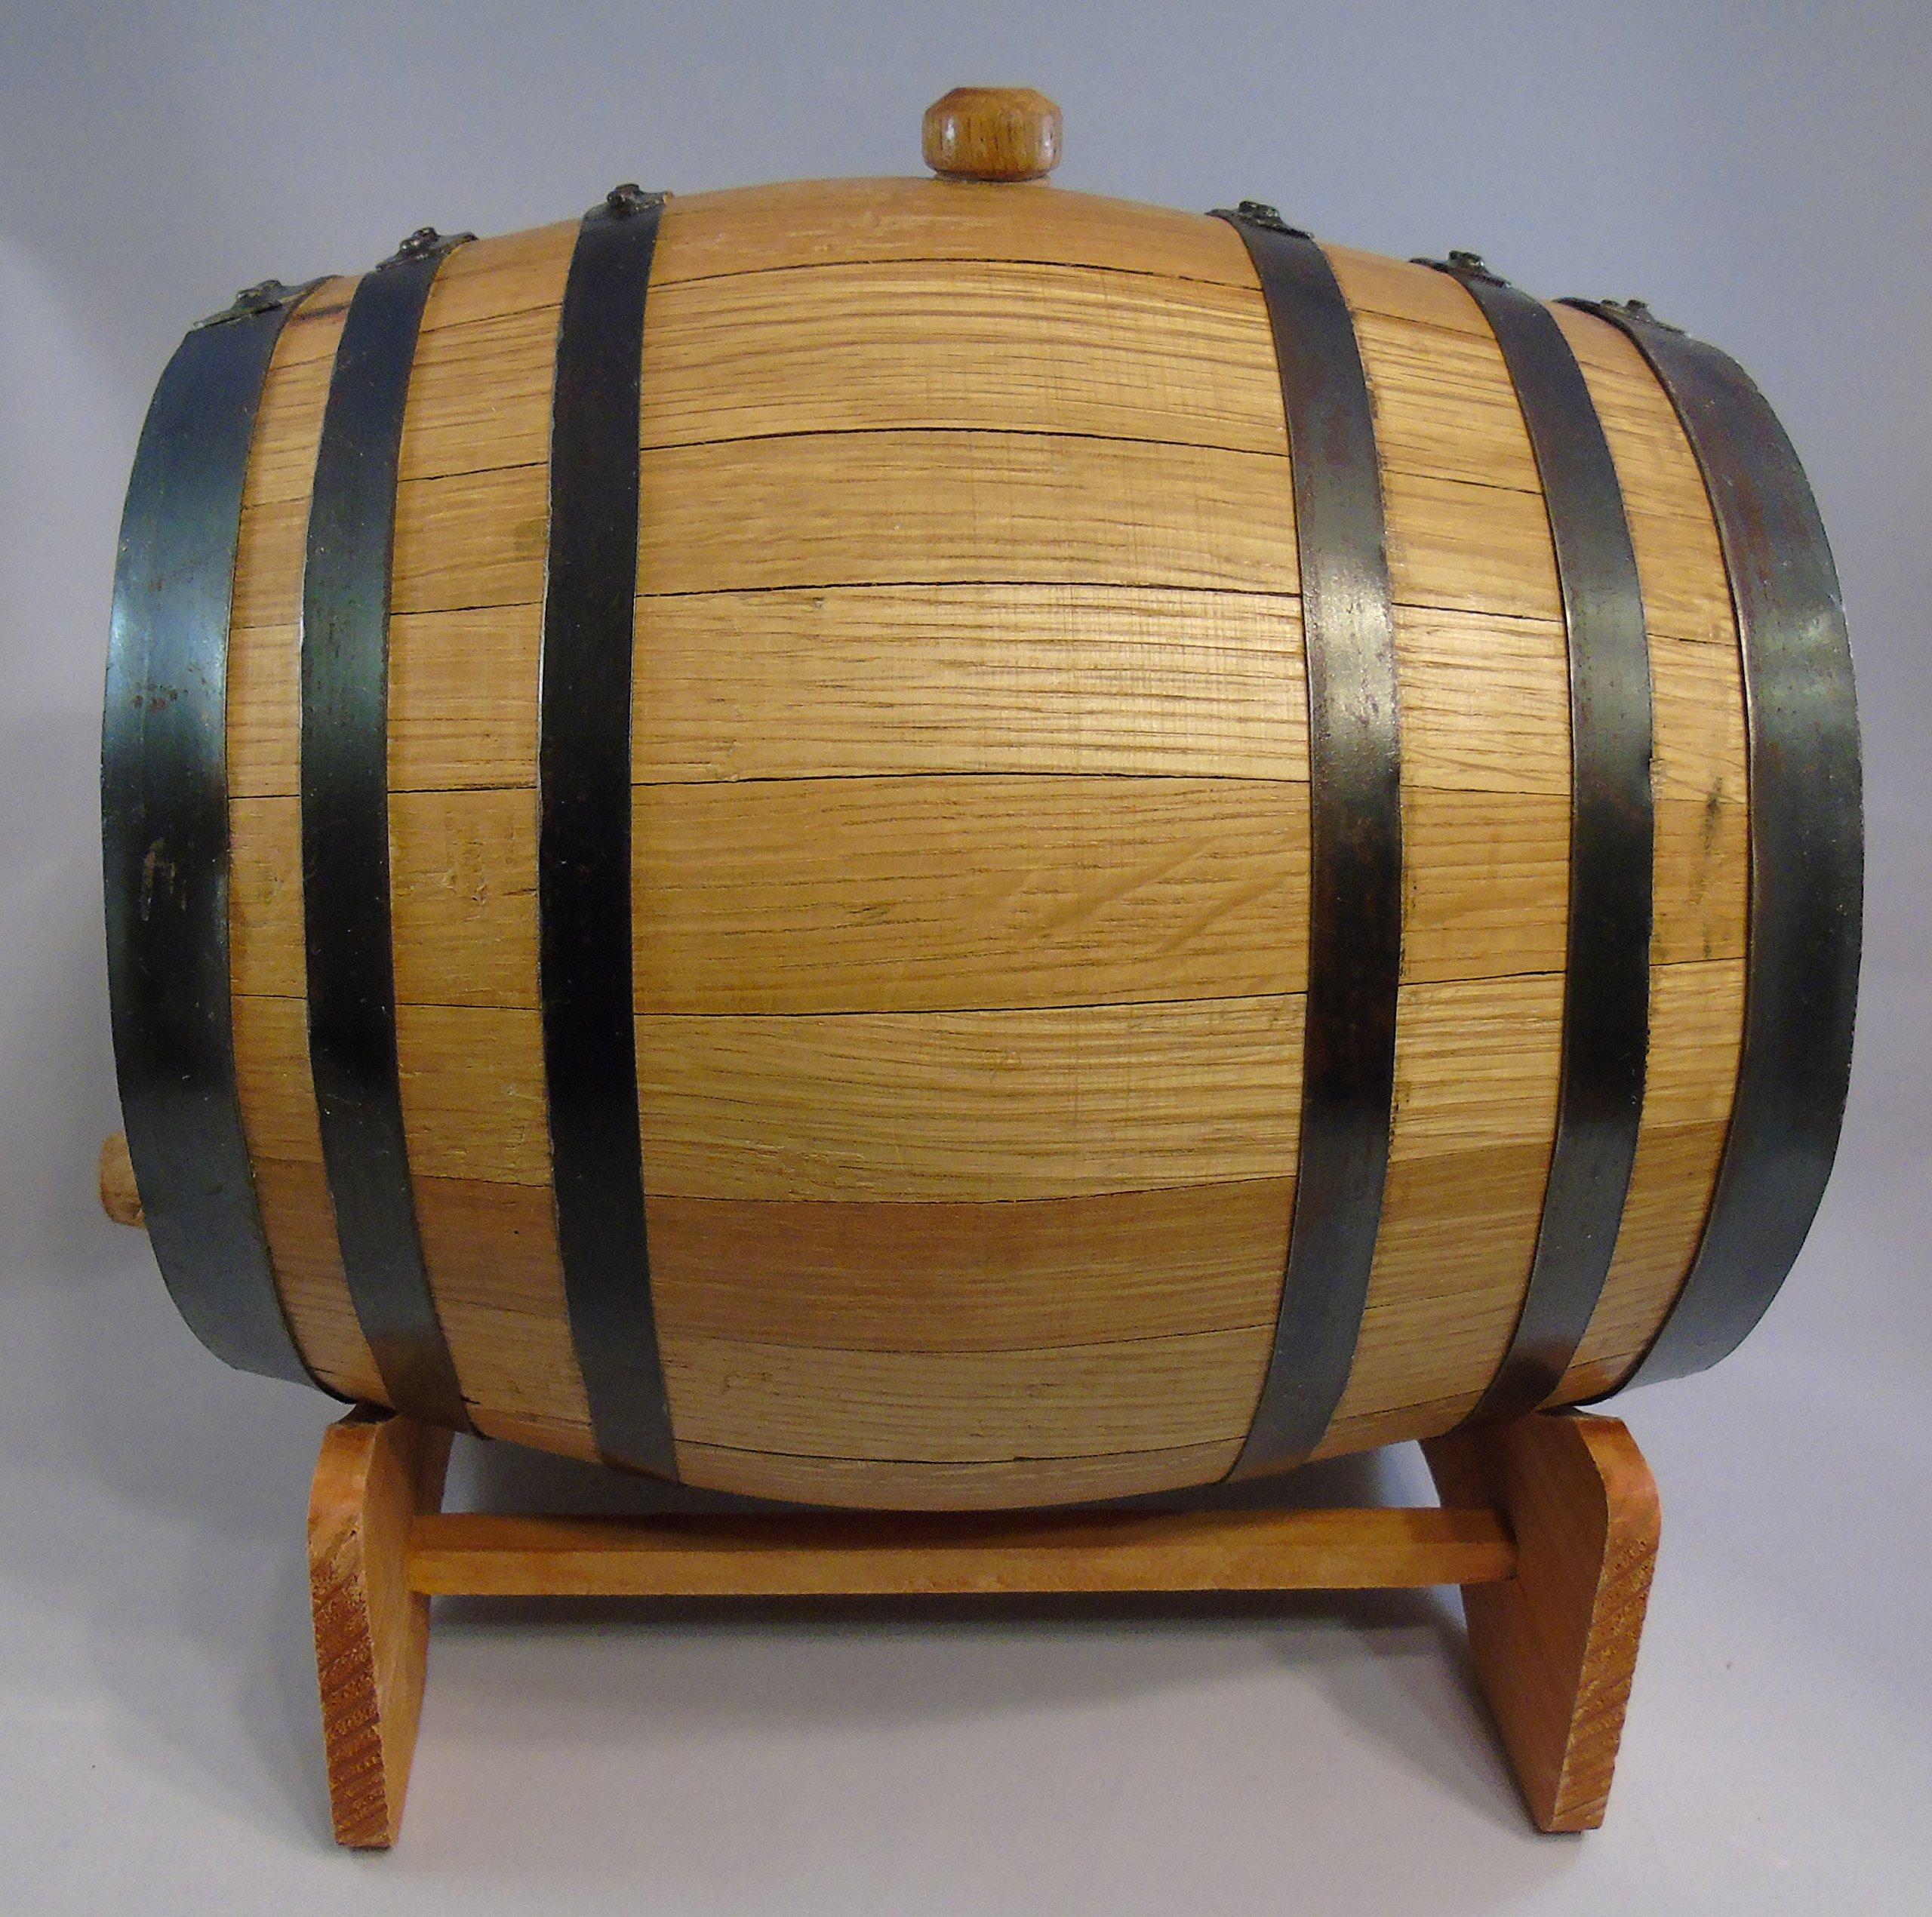 Premium Charred American Oak Aging Barrel - No Engraving (10 Liter) by Red Head Barrels (Image #2)